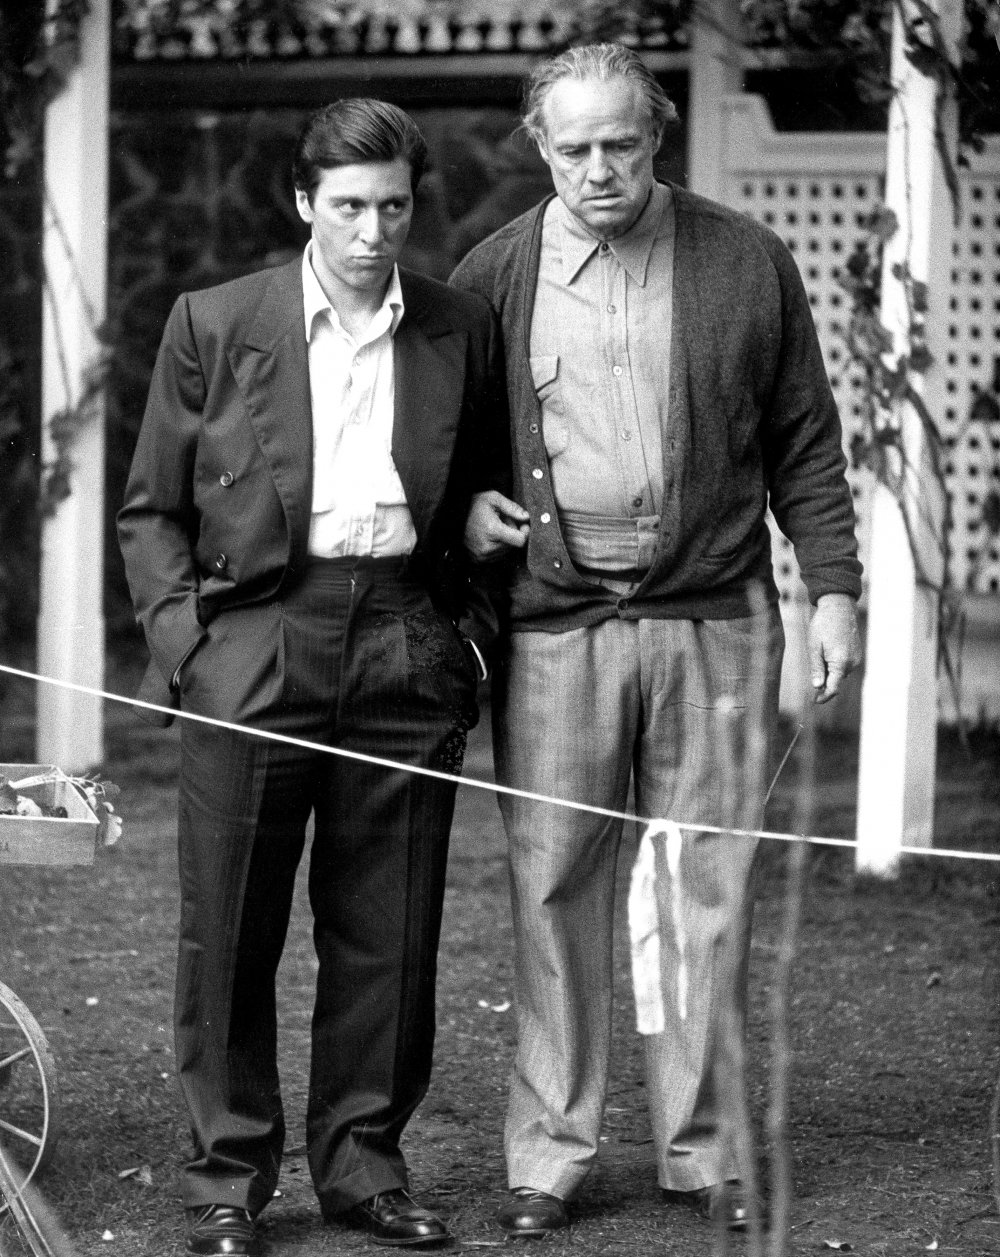 Pacino and Brando on location